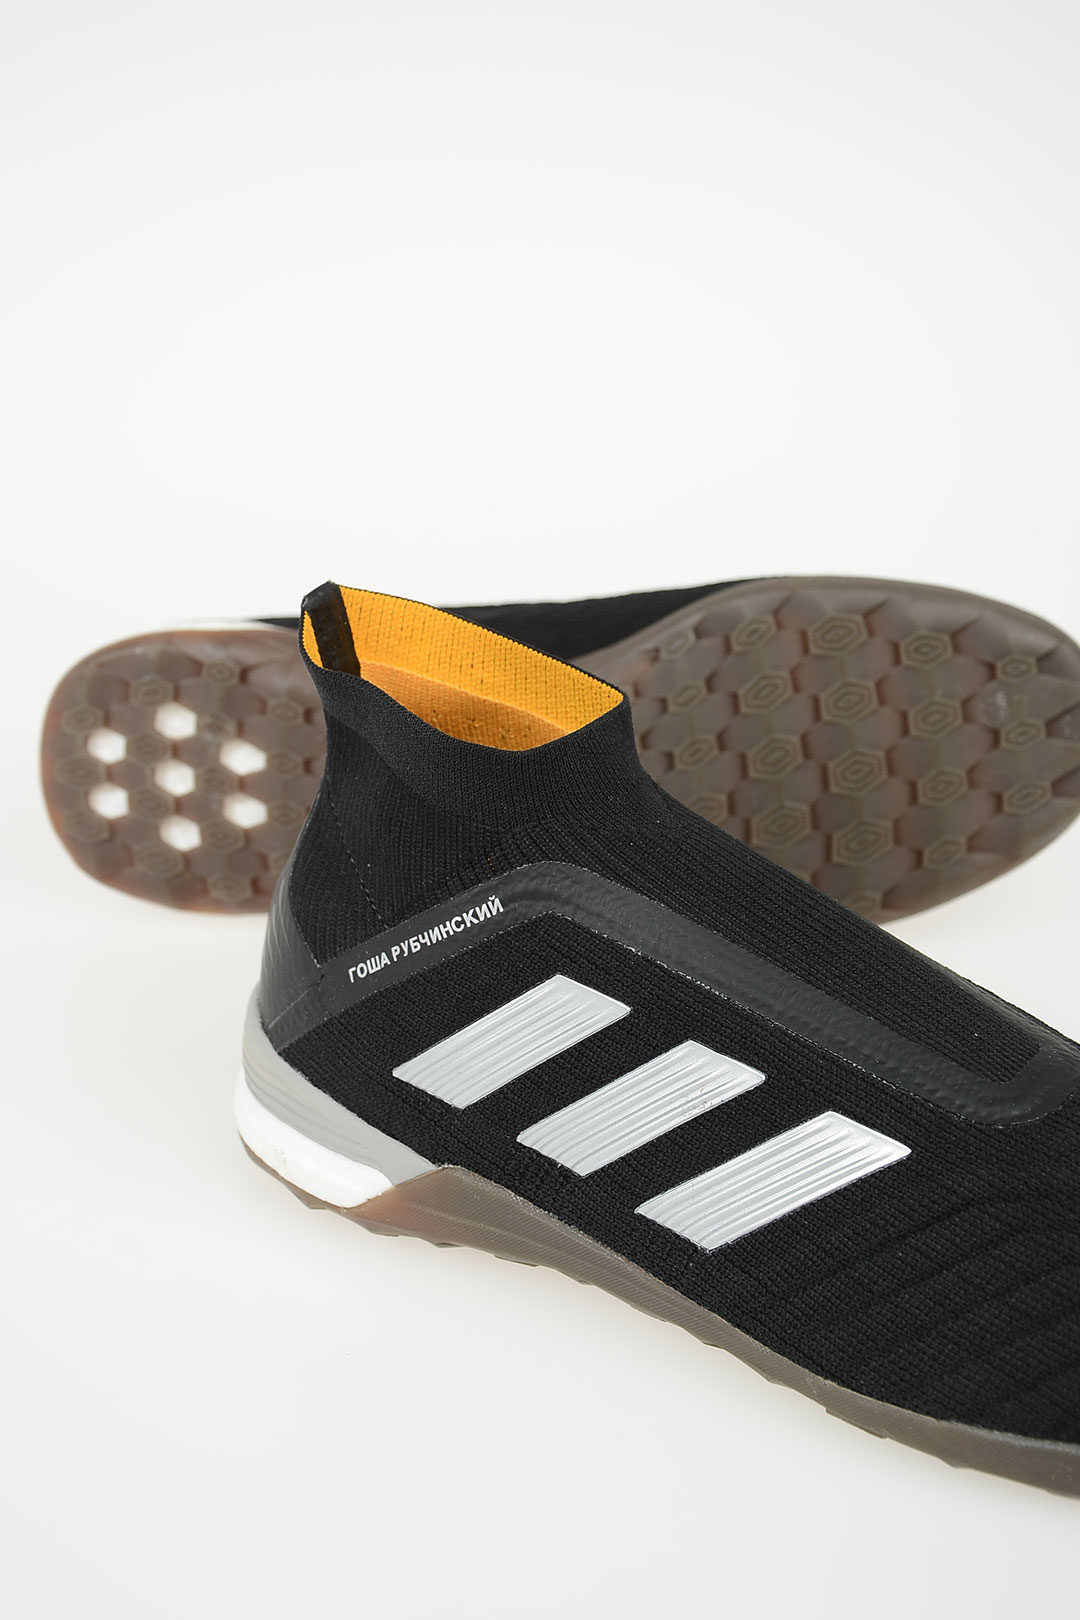 Gosha Rubchinsky Adidas Sneaker scarpe Taglia: UK 7,5